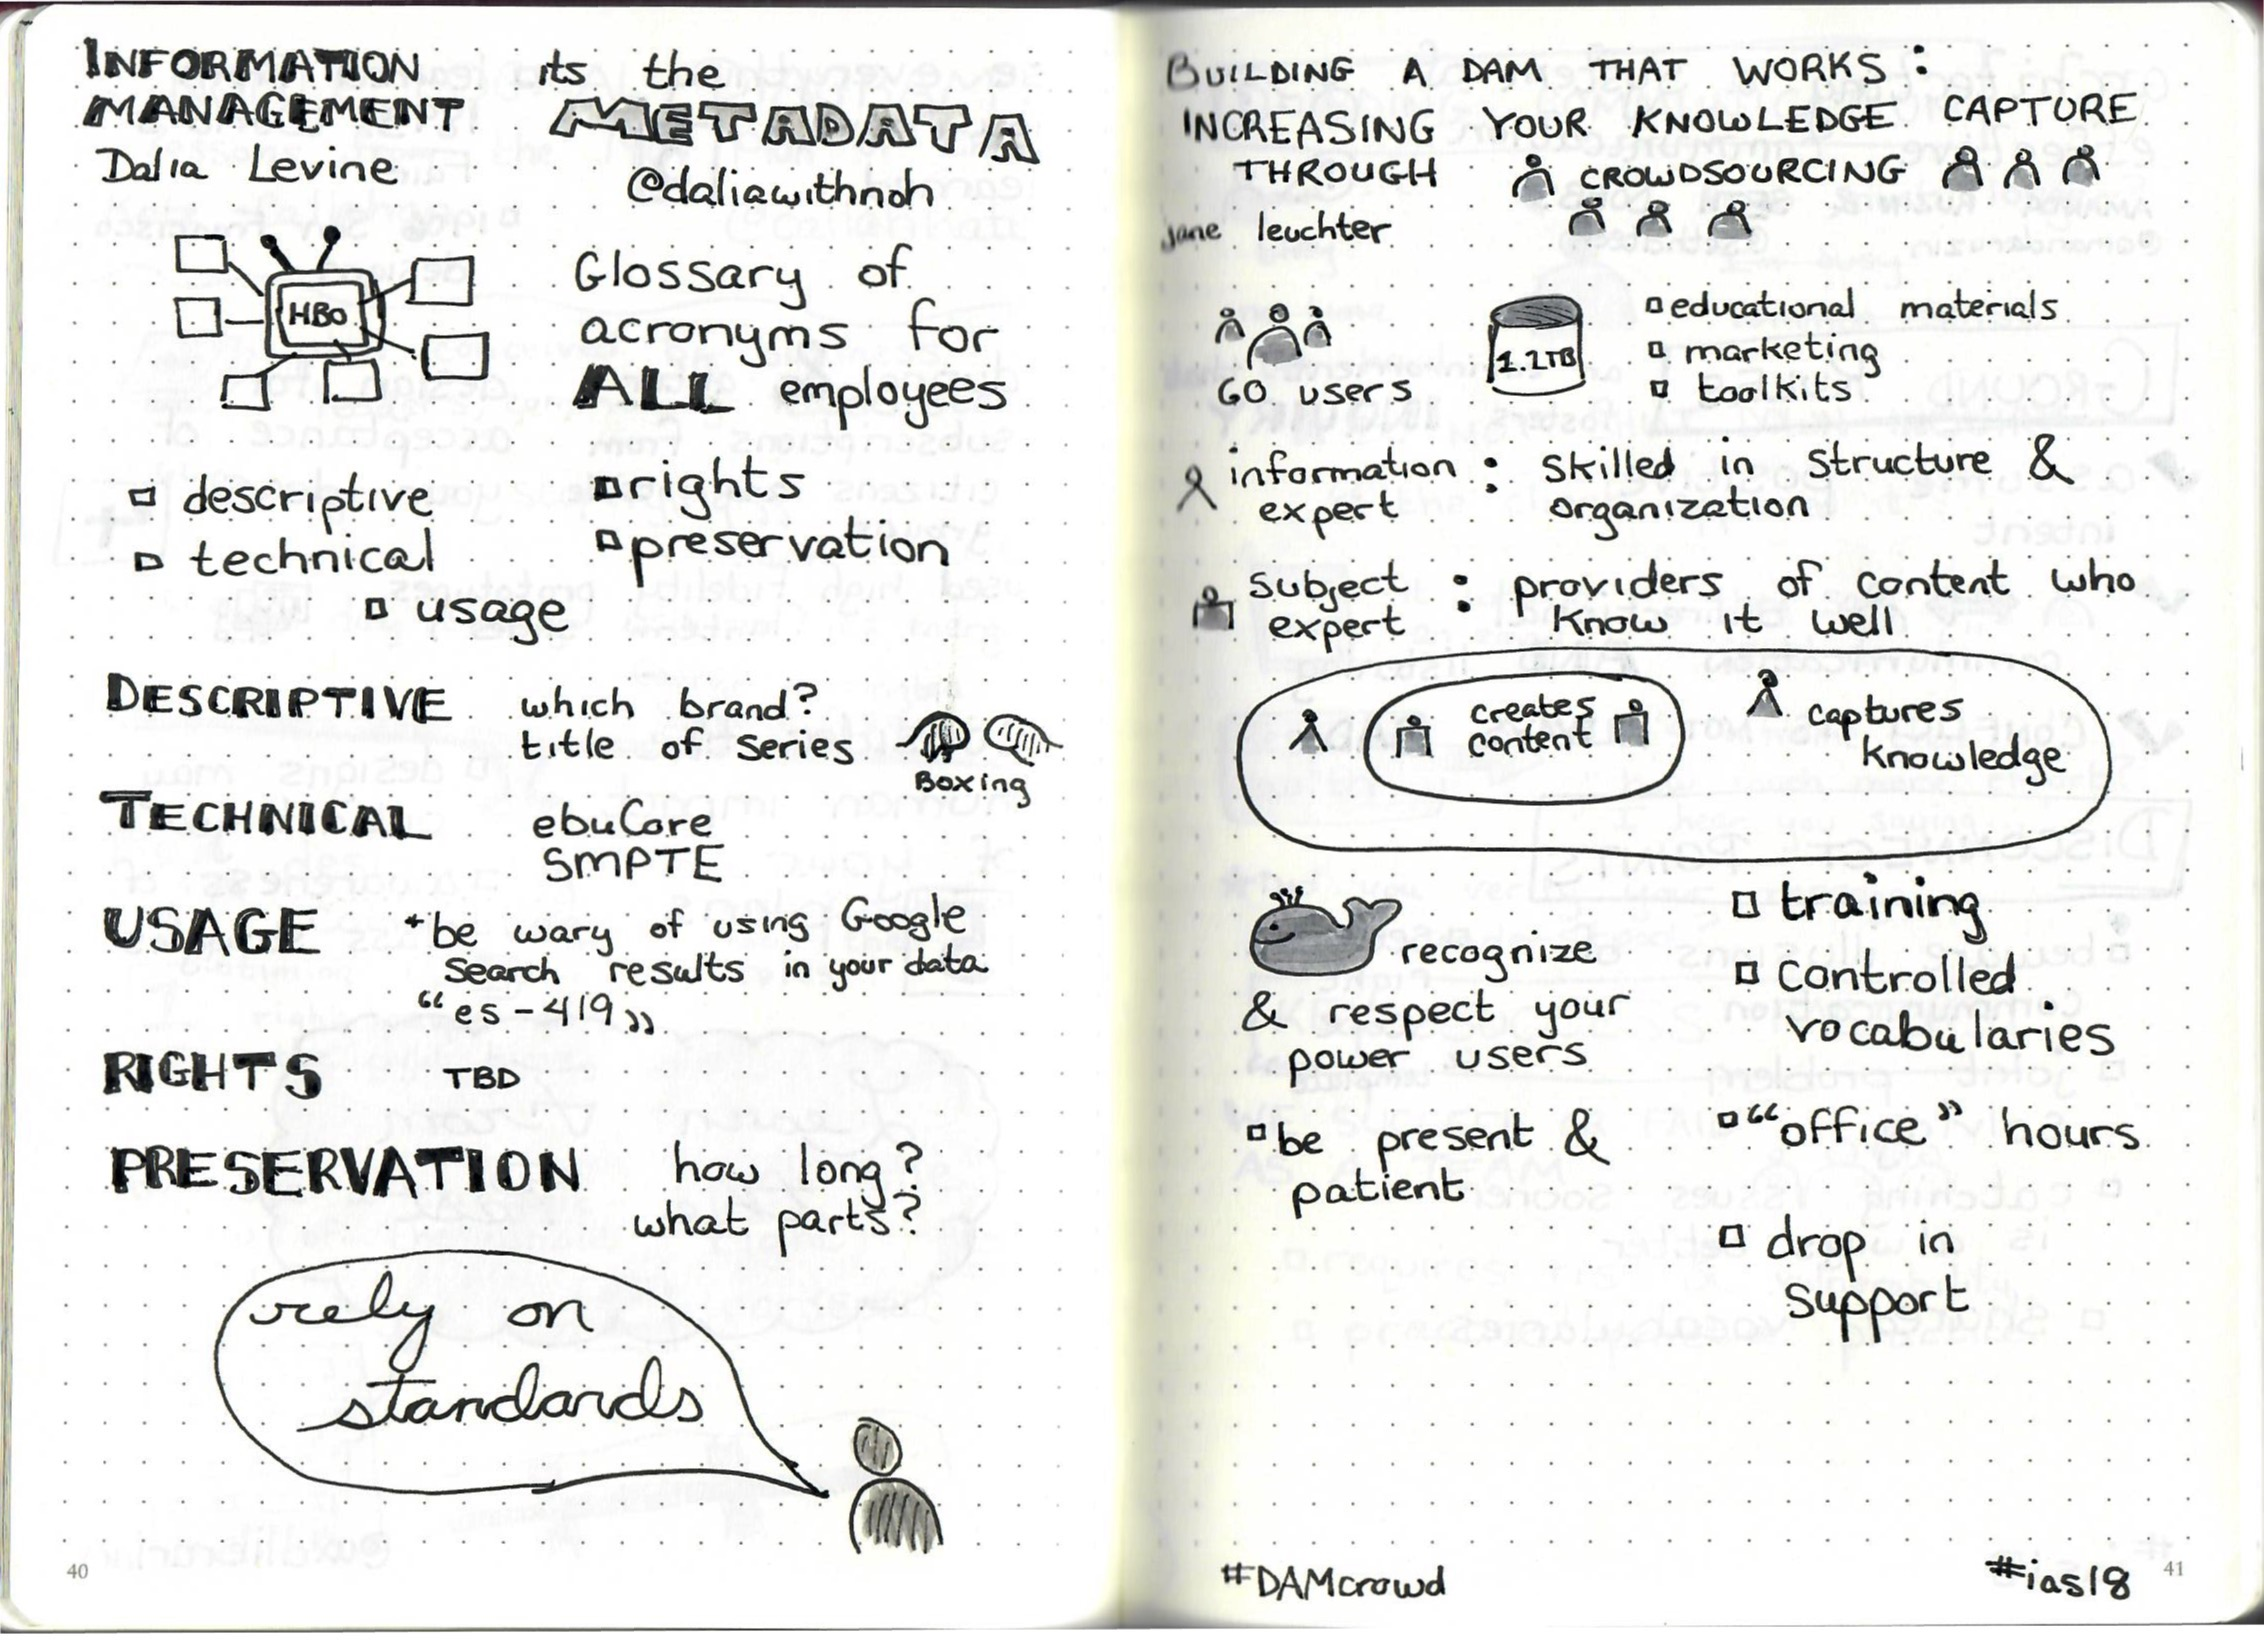 Information Management Its the Metadata (Dalia Levine).jpg